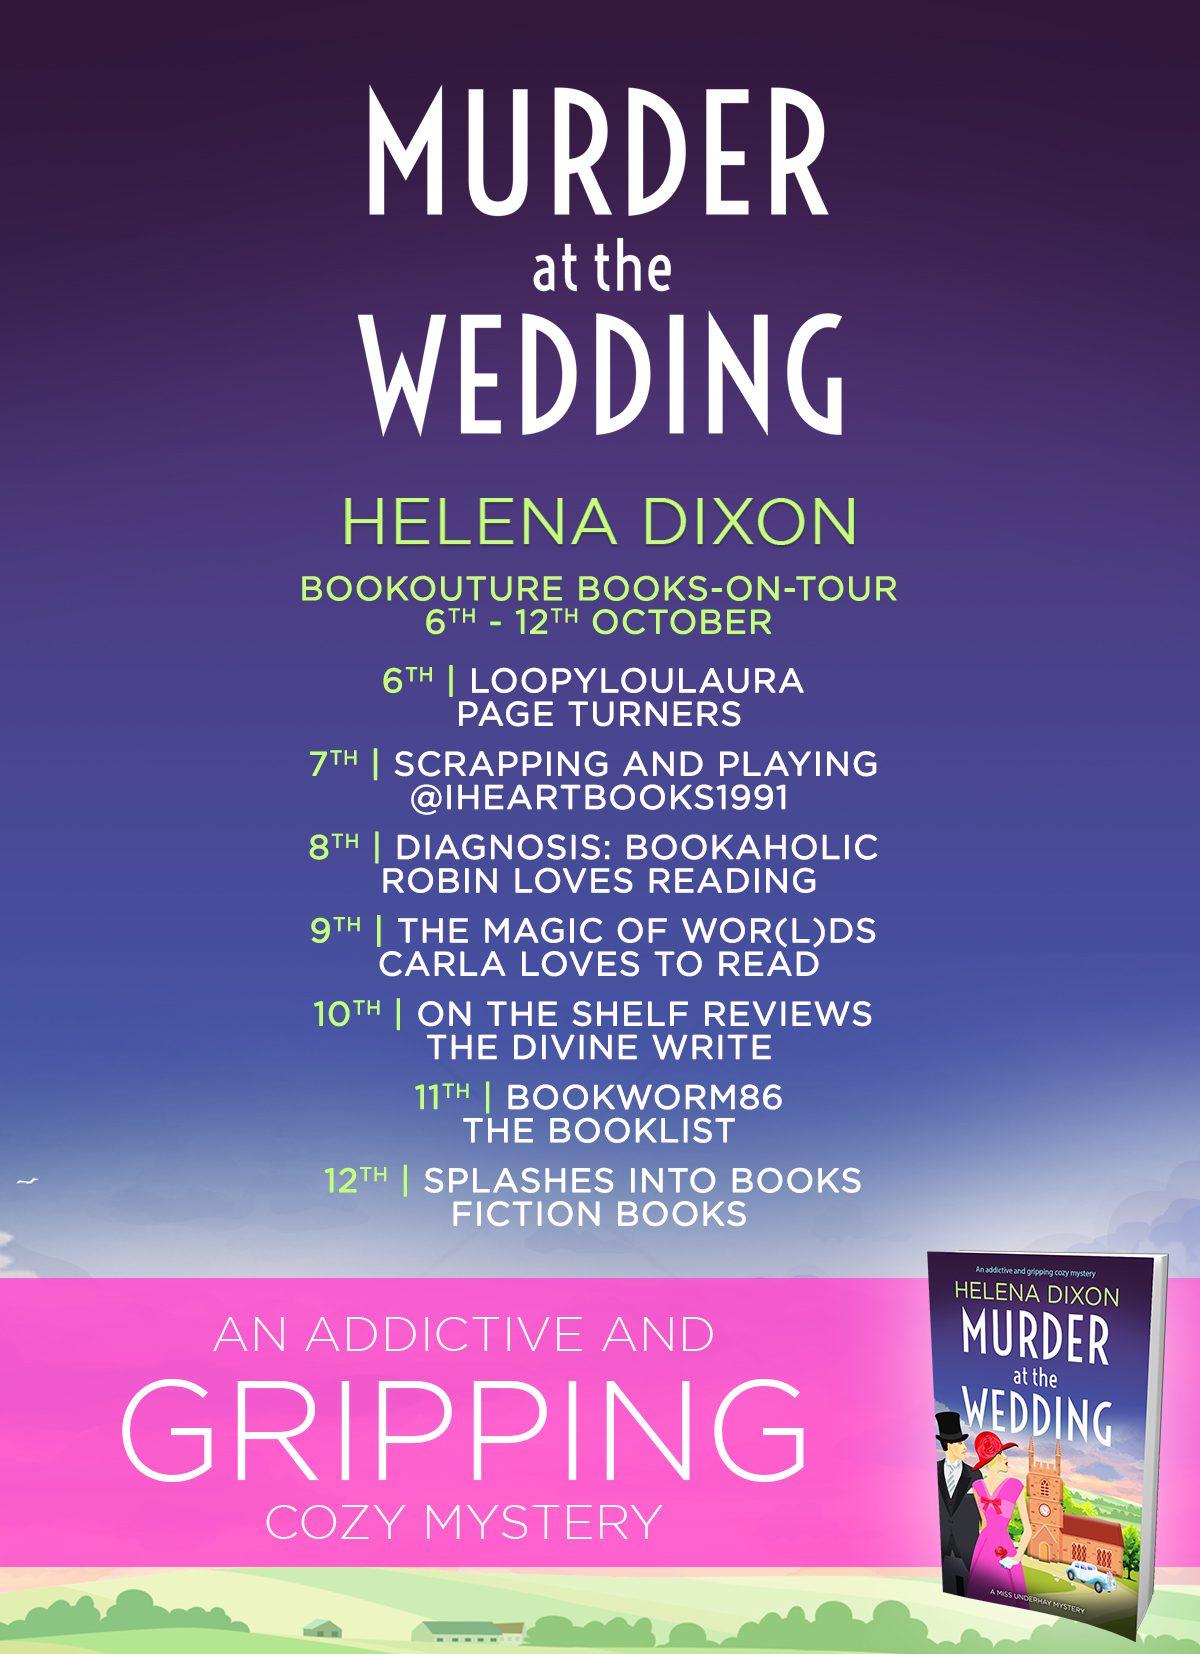 Murder at the Wedding blog tour banner